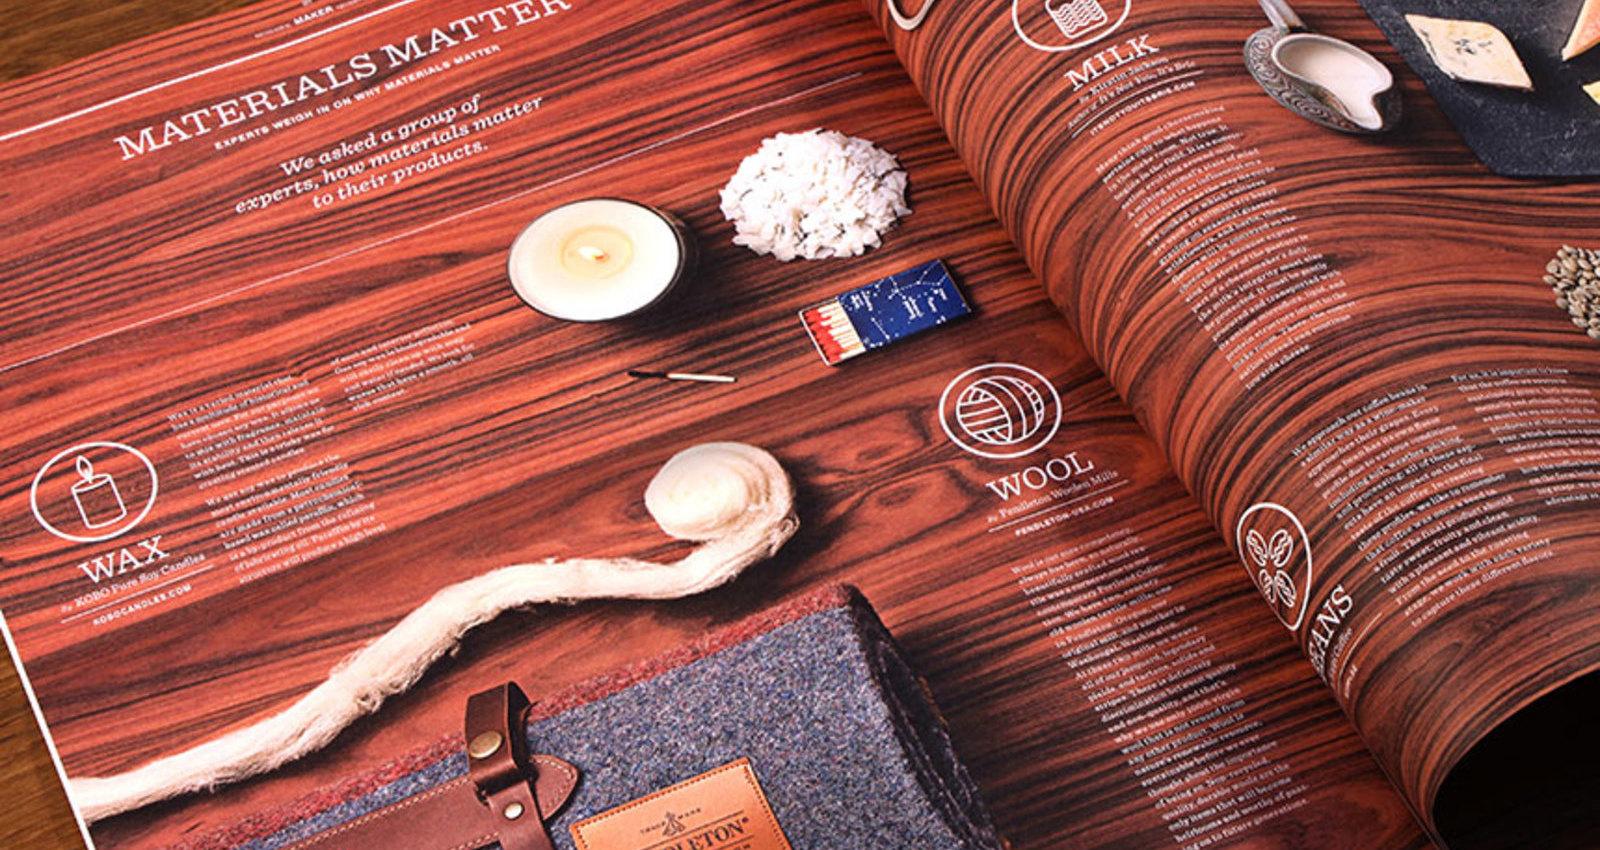 Mohawk Culture of Craft